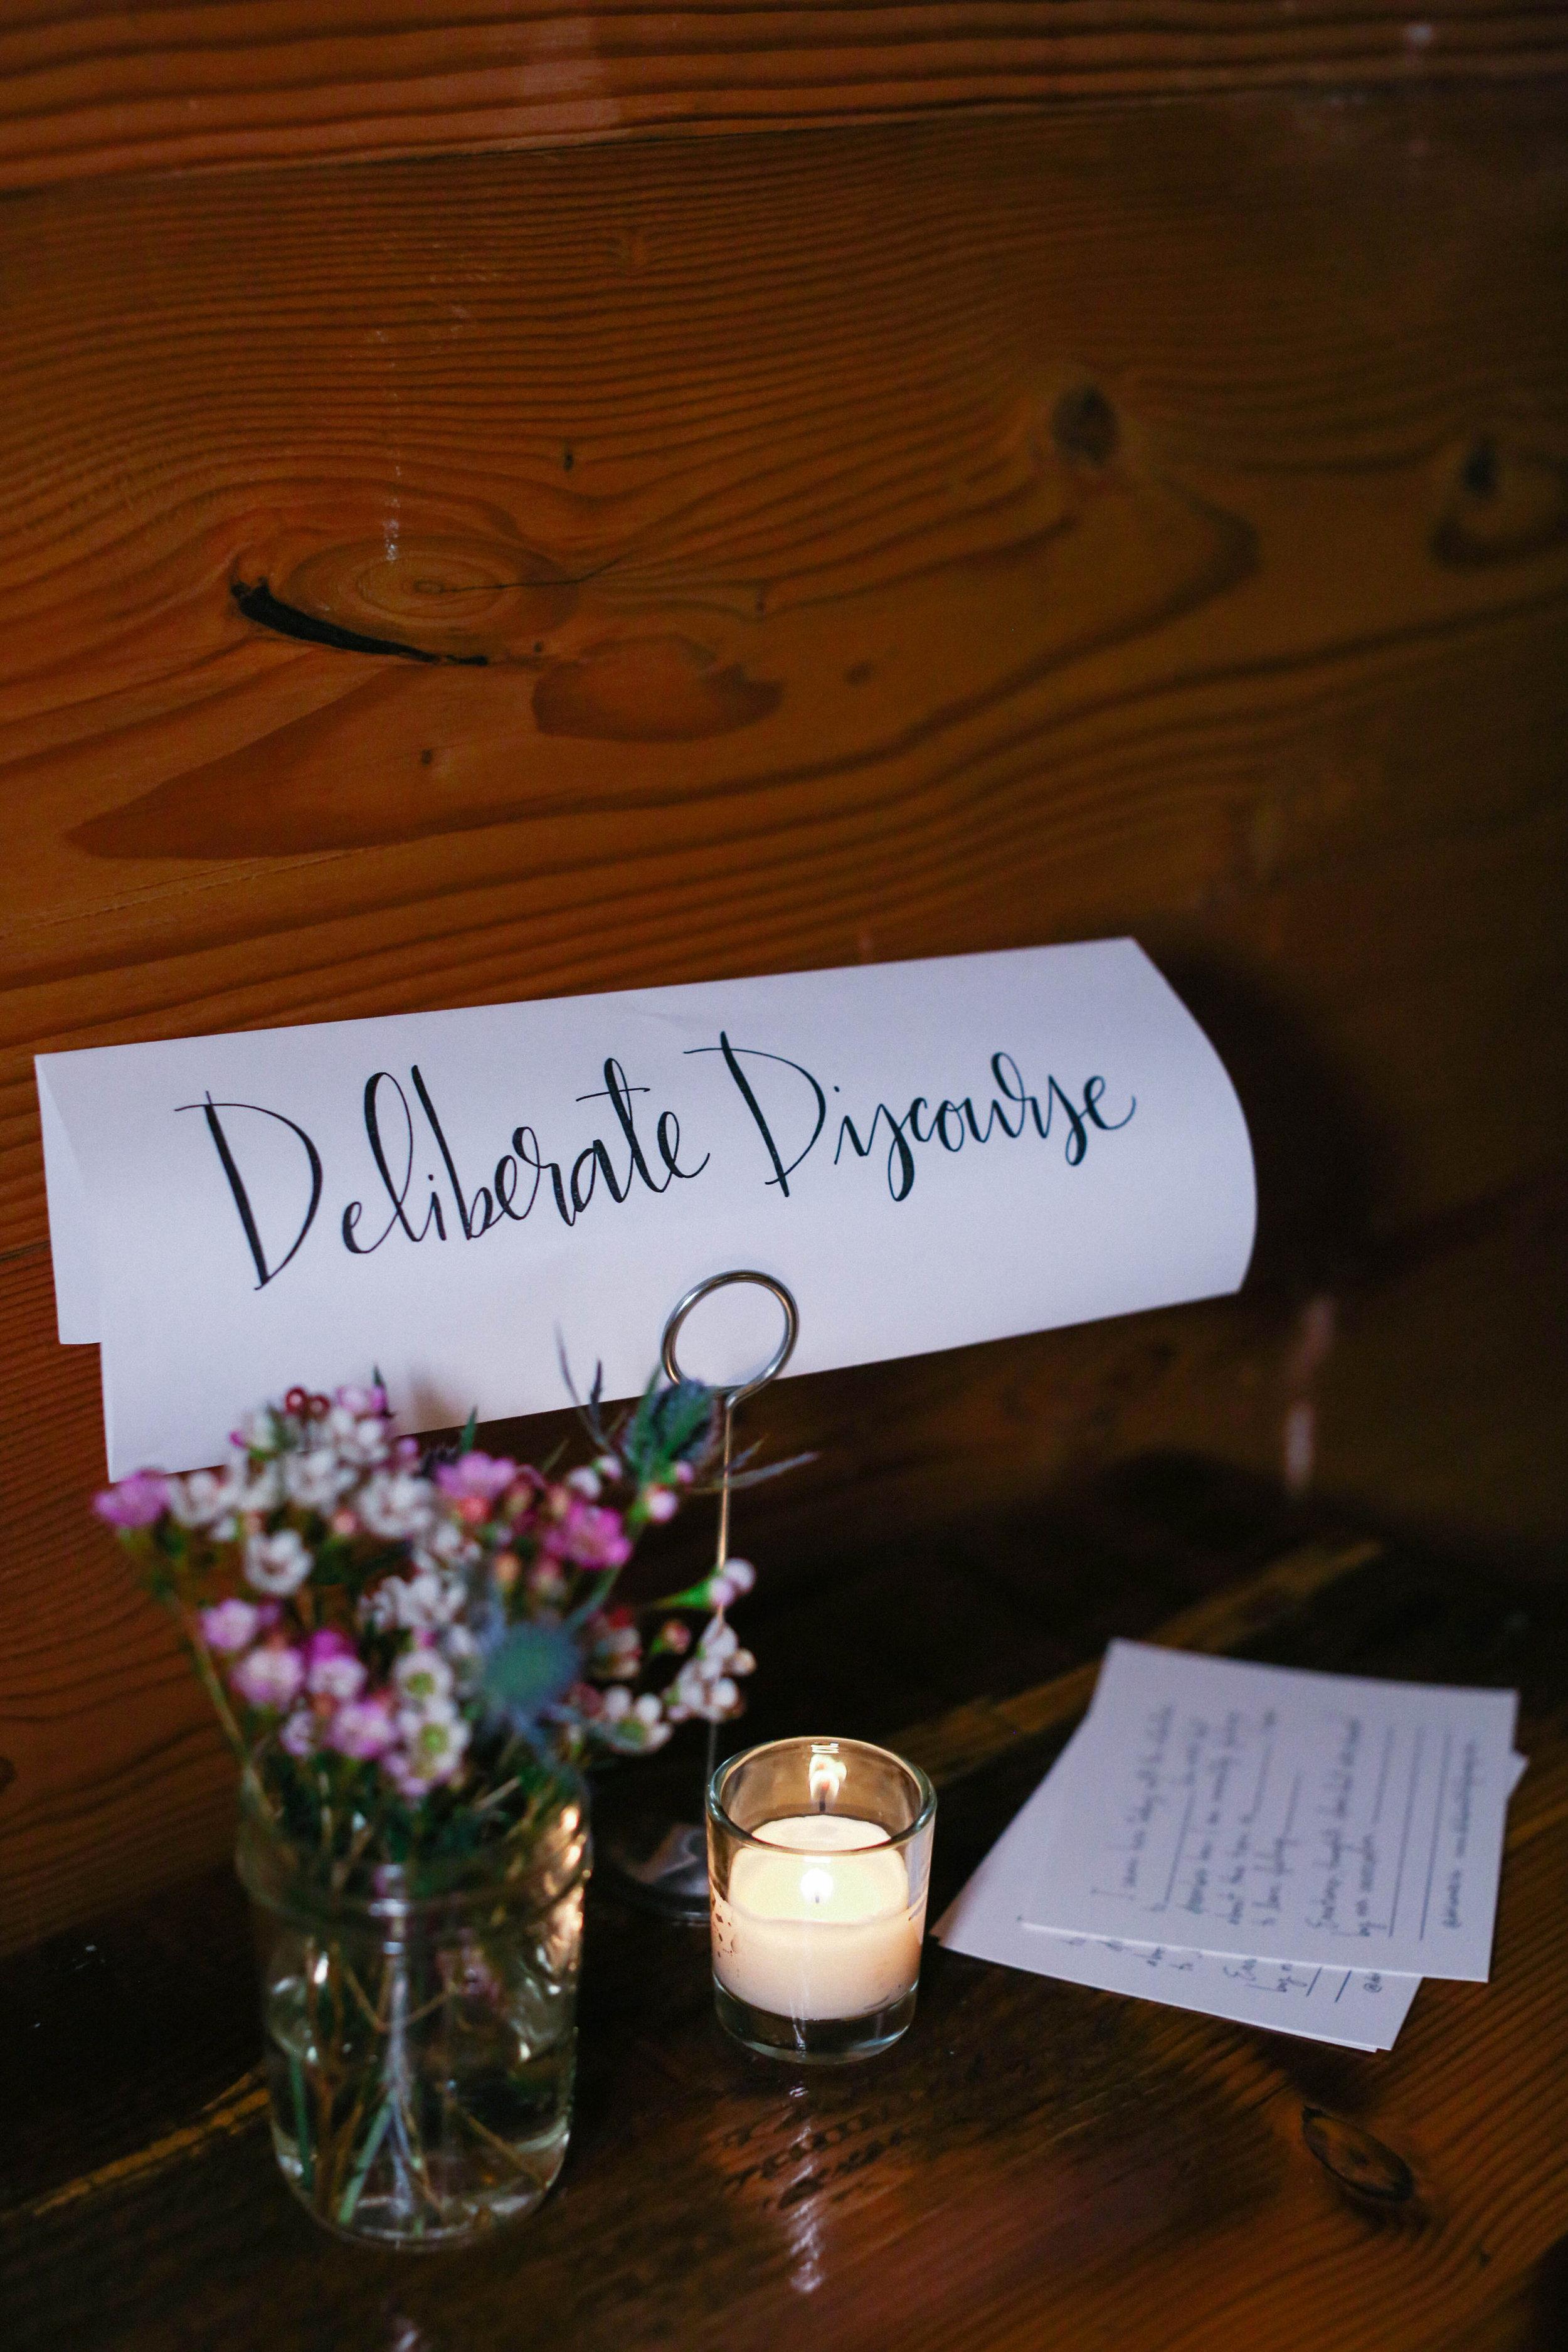 dLIFE discourse-0032.jpg